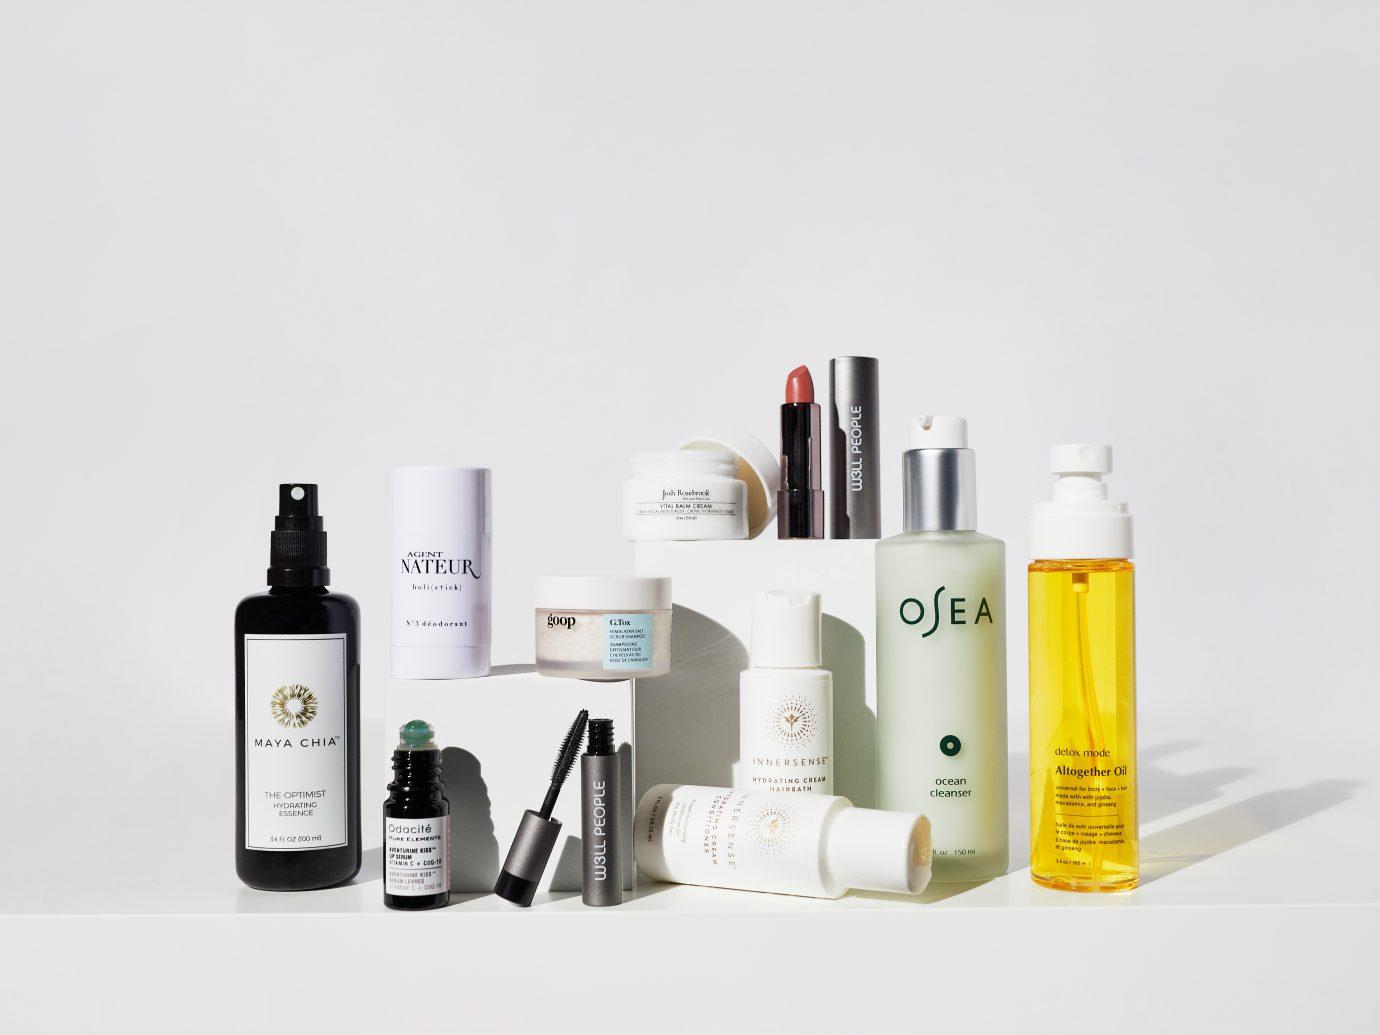 The Detox Box Green Beauty Subscription